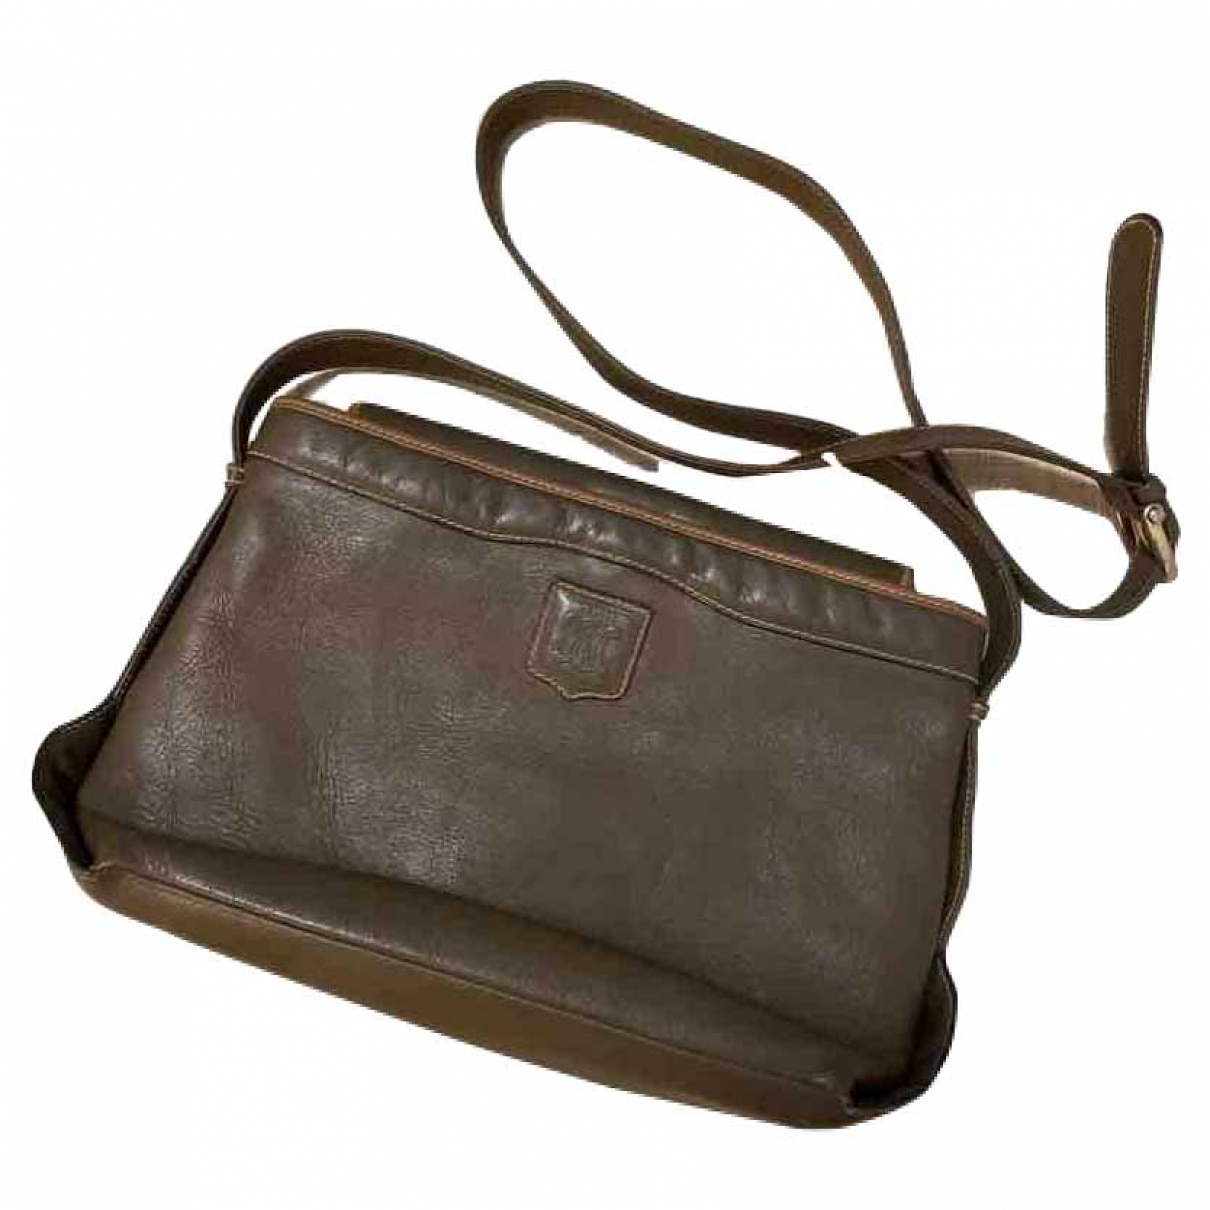 Celine \N Handtasche in  Gruen Leder